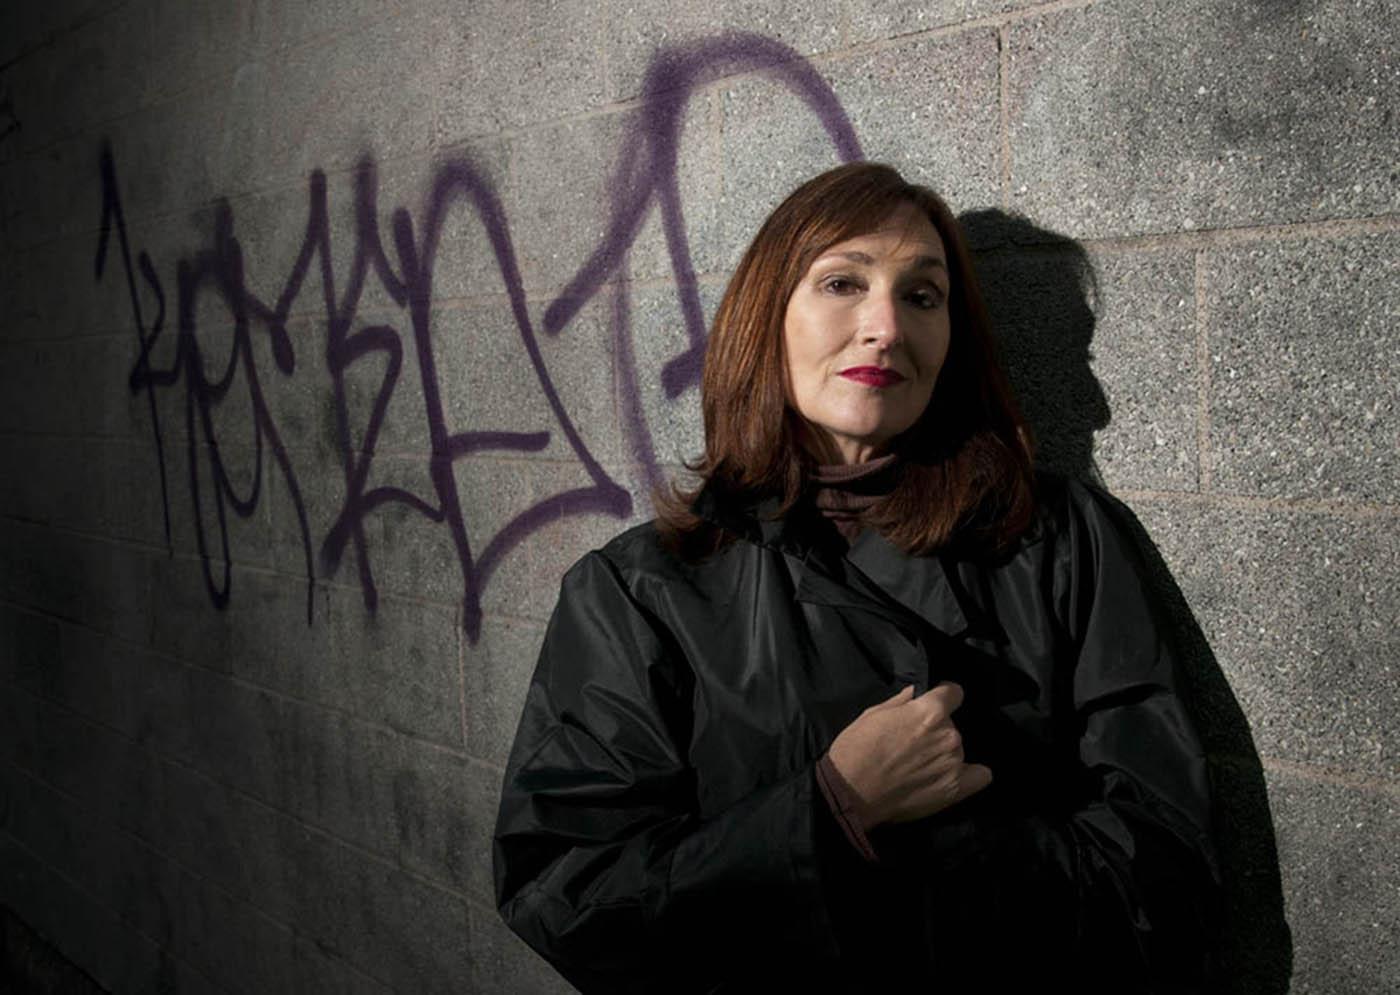 Nora Dunn portrait